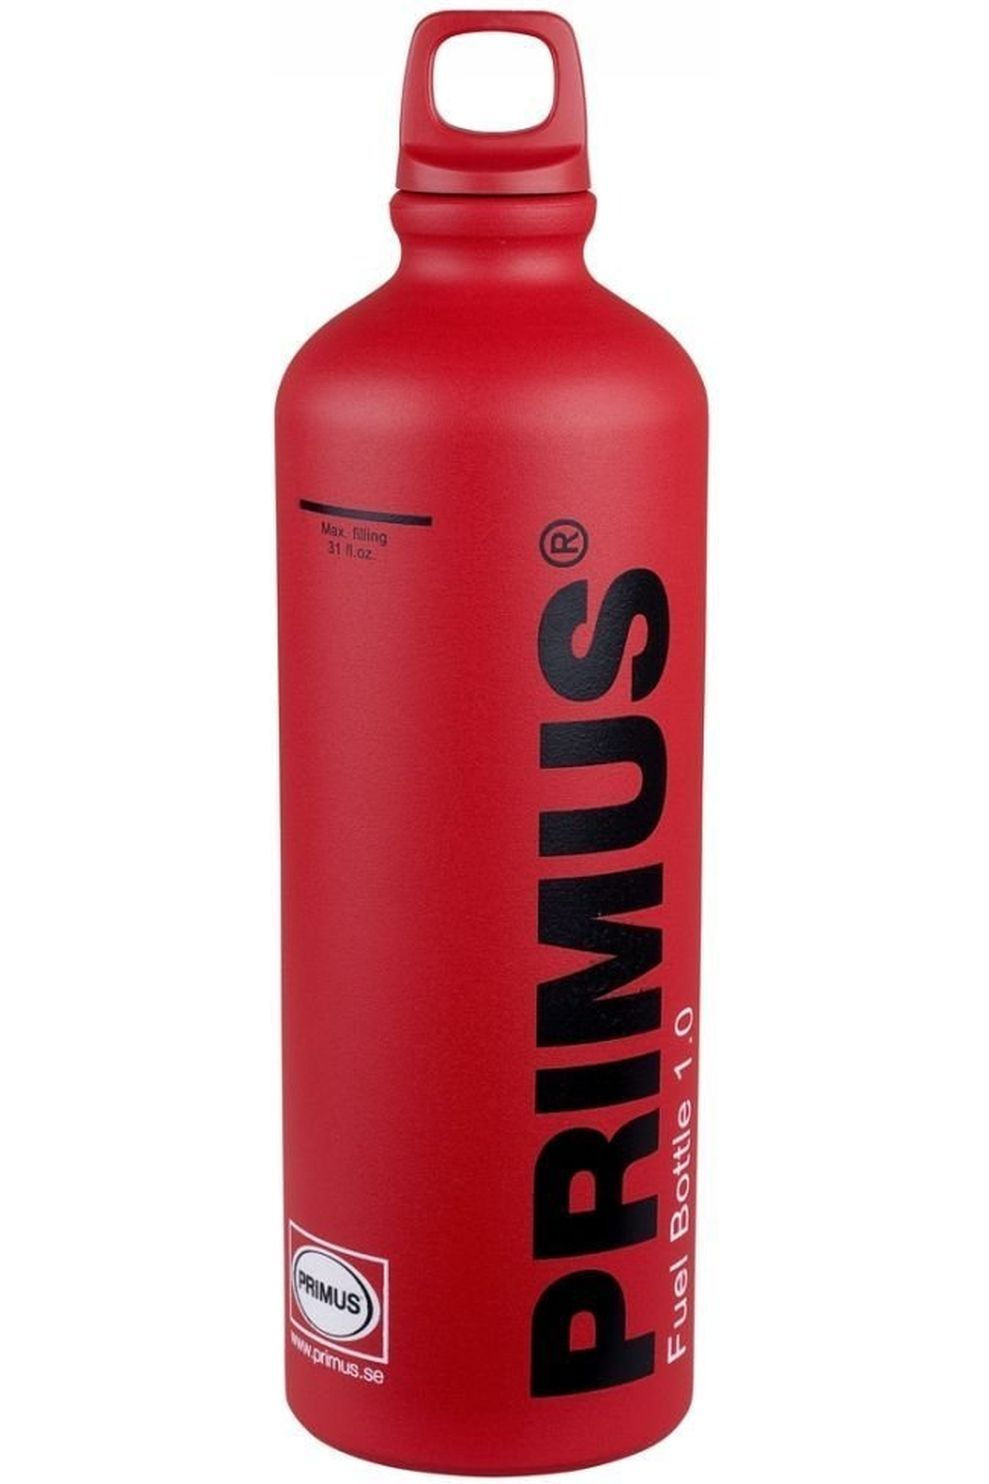 Primus Brander Acc Fuel Bottle 1.0L - Rood